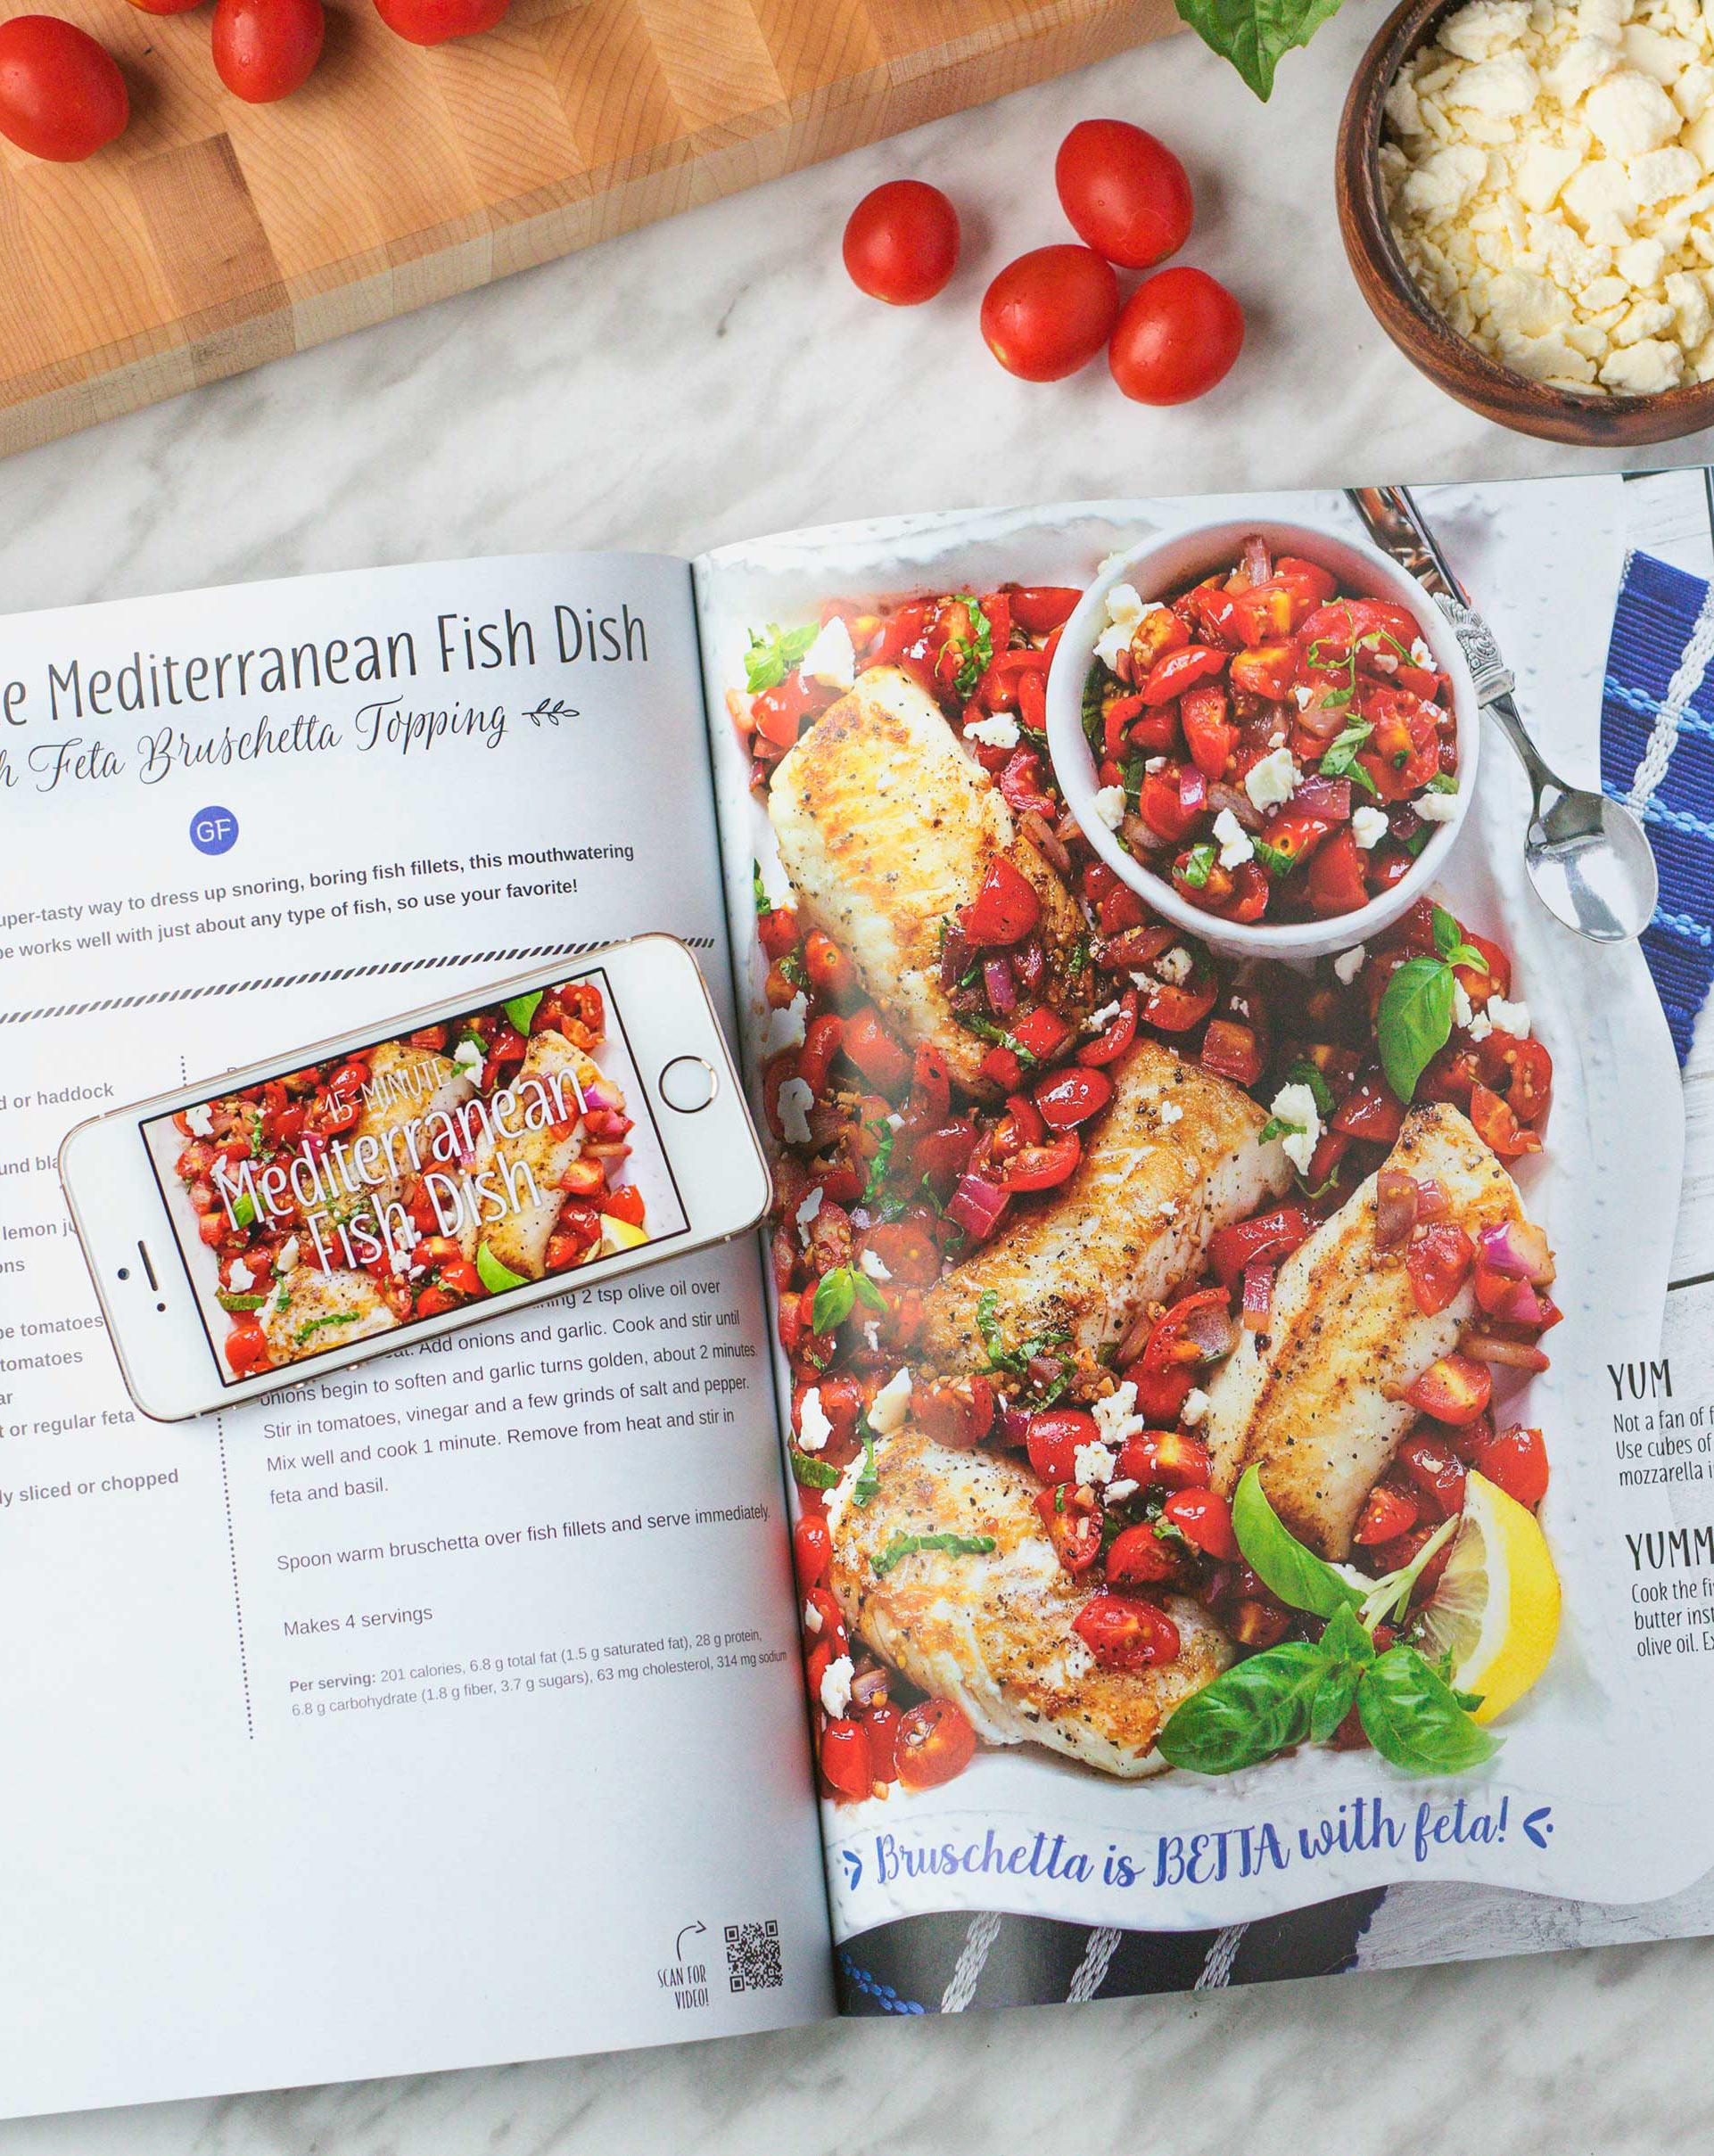 Mediterranean Fish Dish in Yum and Yummer